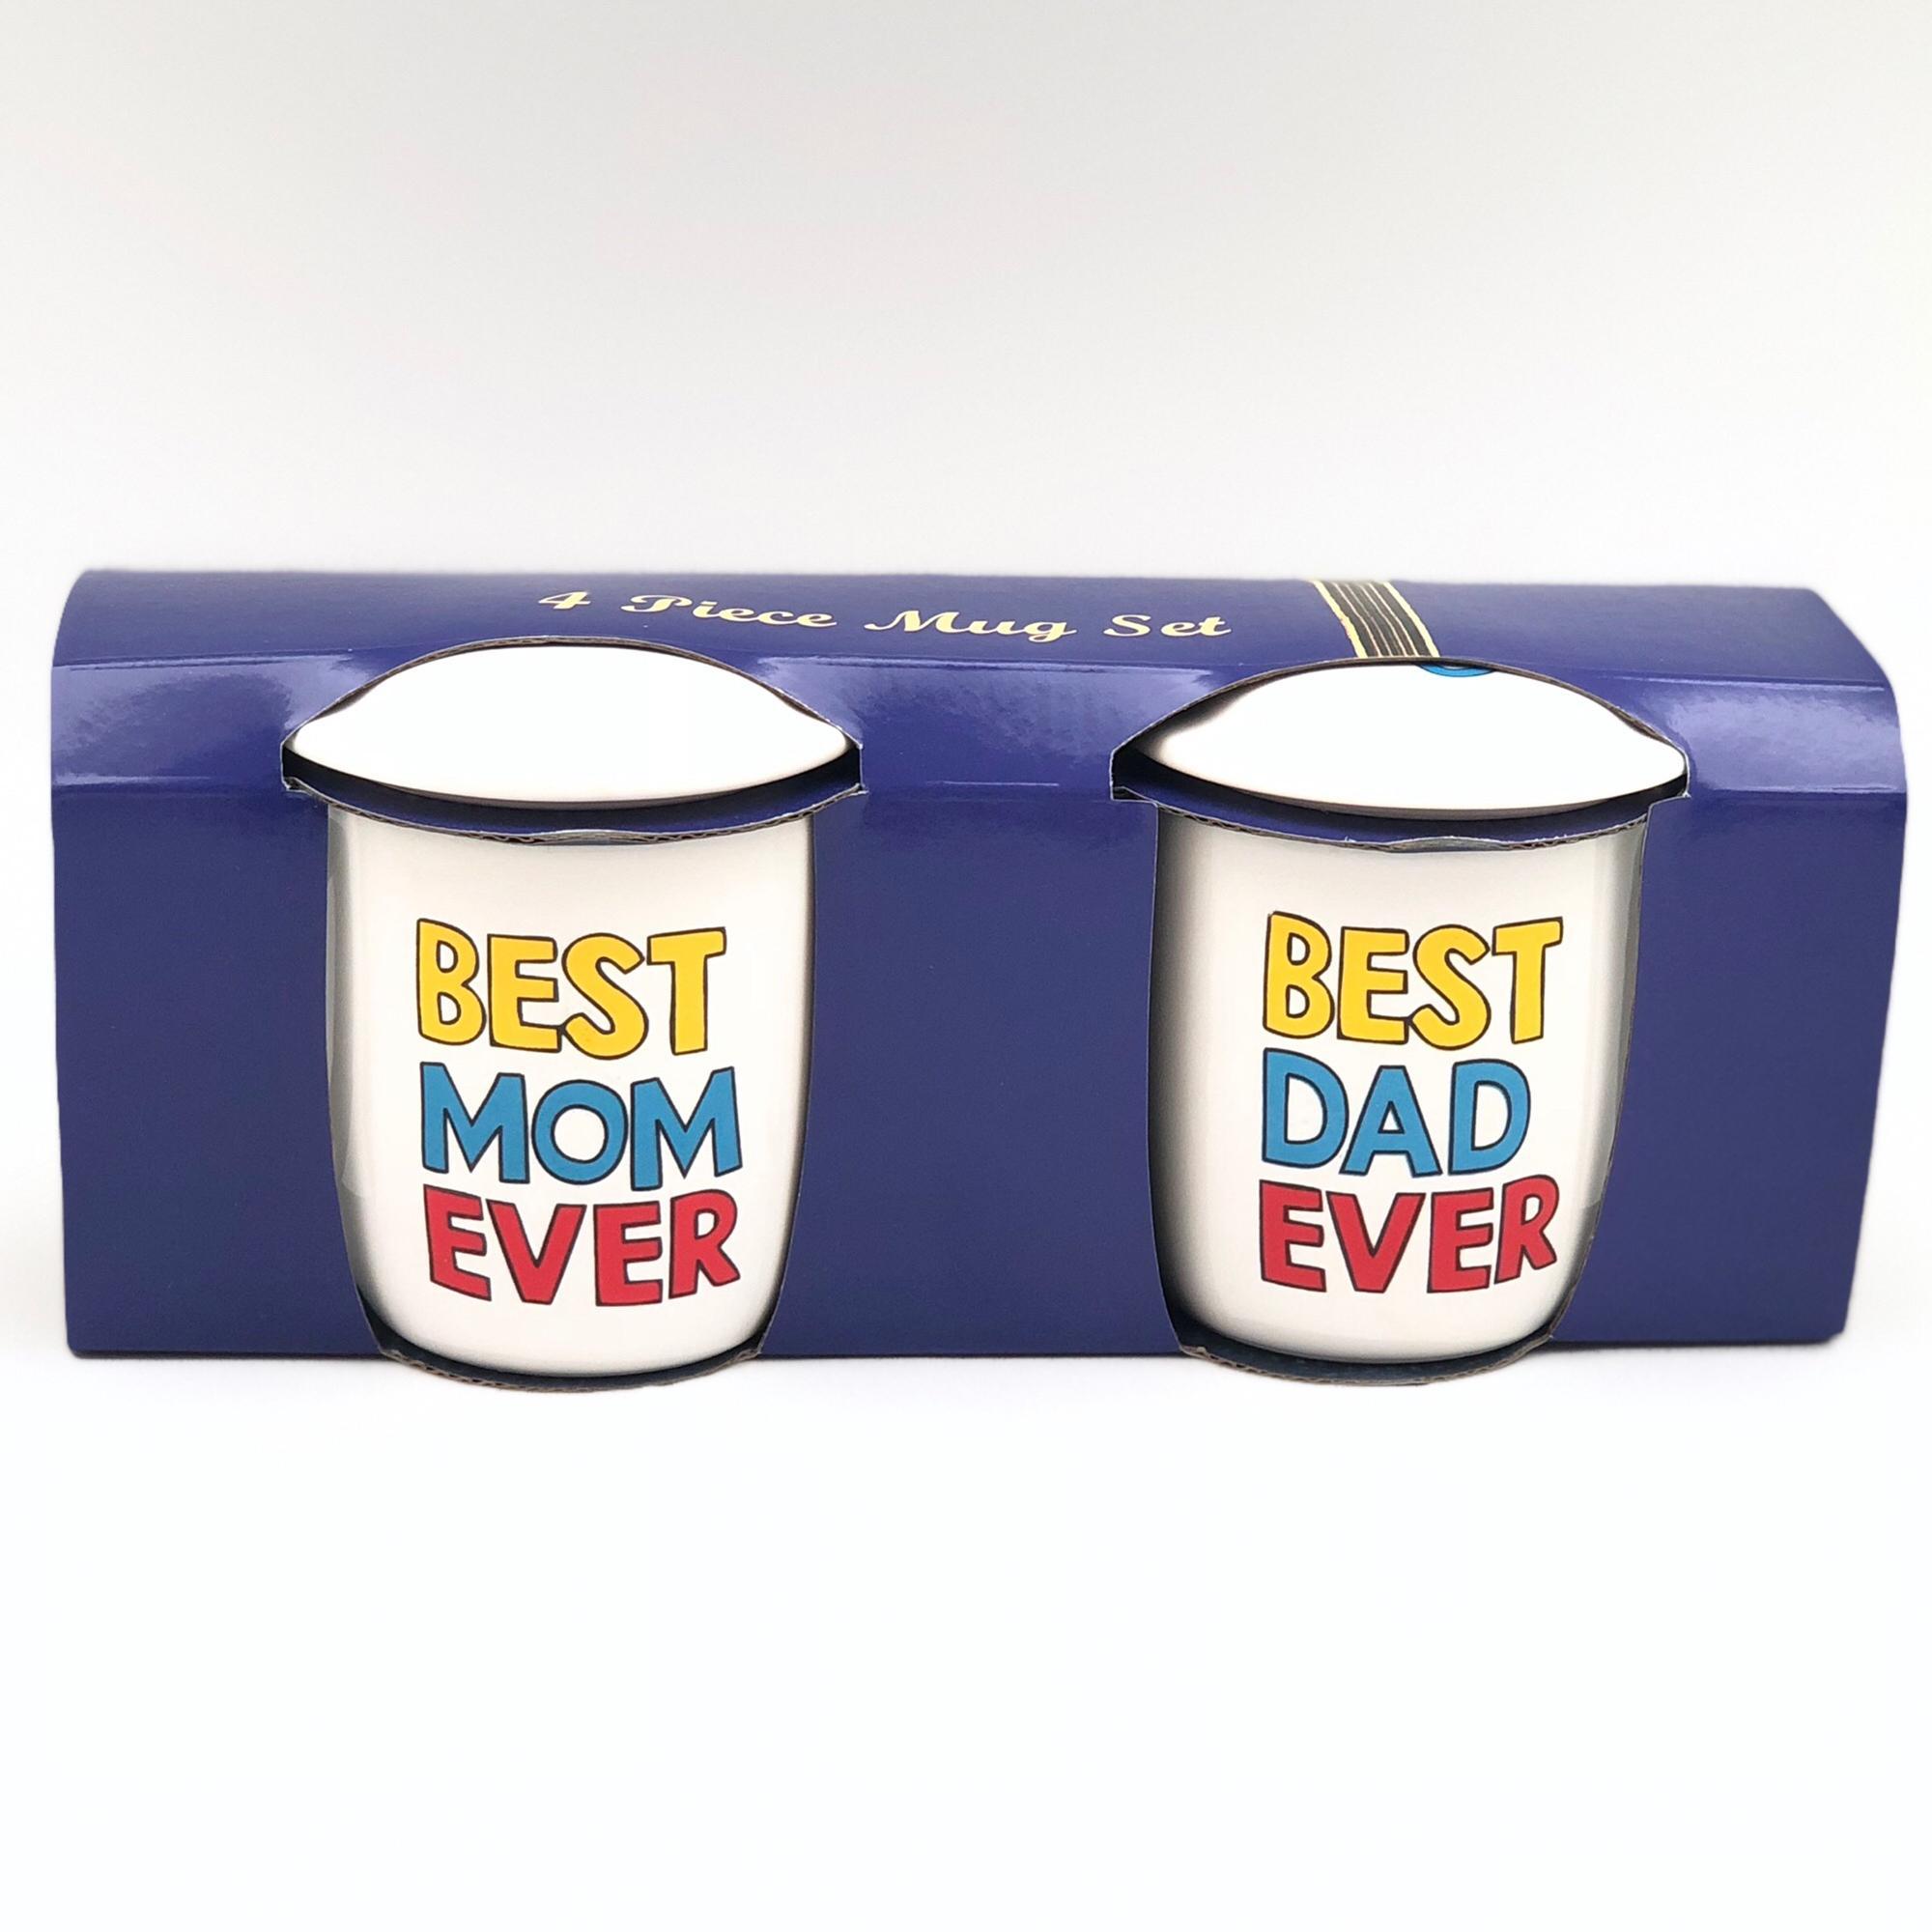 ... Mug Couple + Tutup / Best Mom Ever / Best Dad Ever / Mug Keramik -